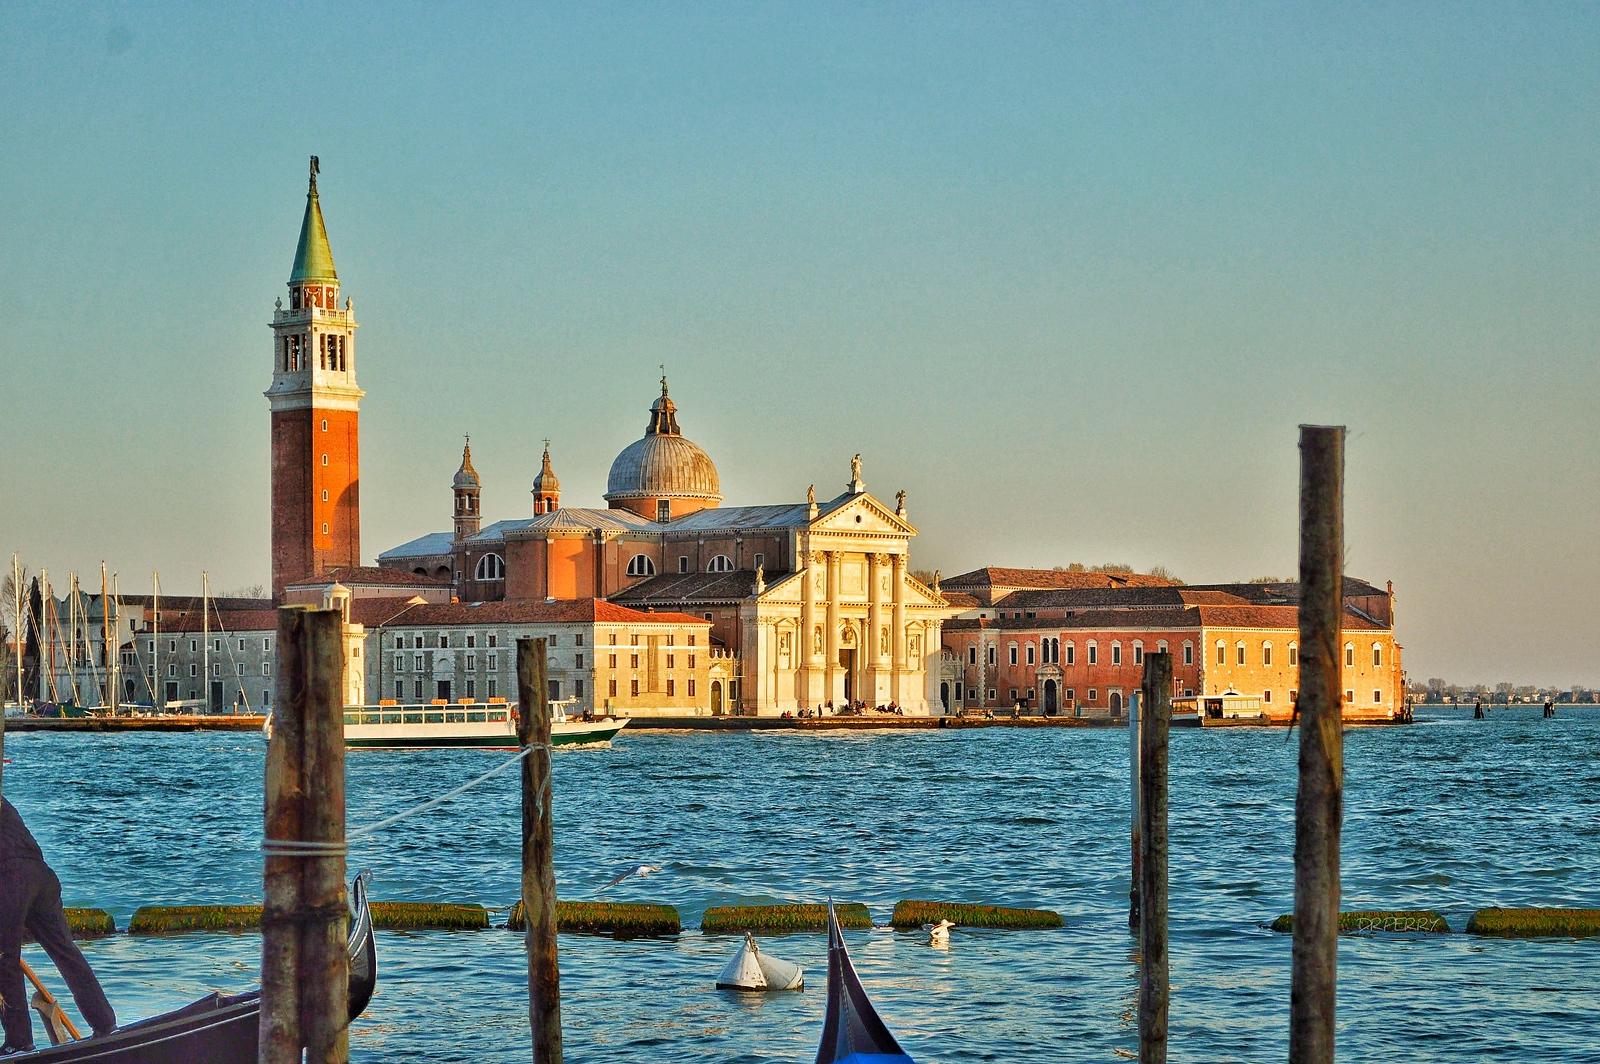 """Rising From the Water"" - Venezia, Italia"